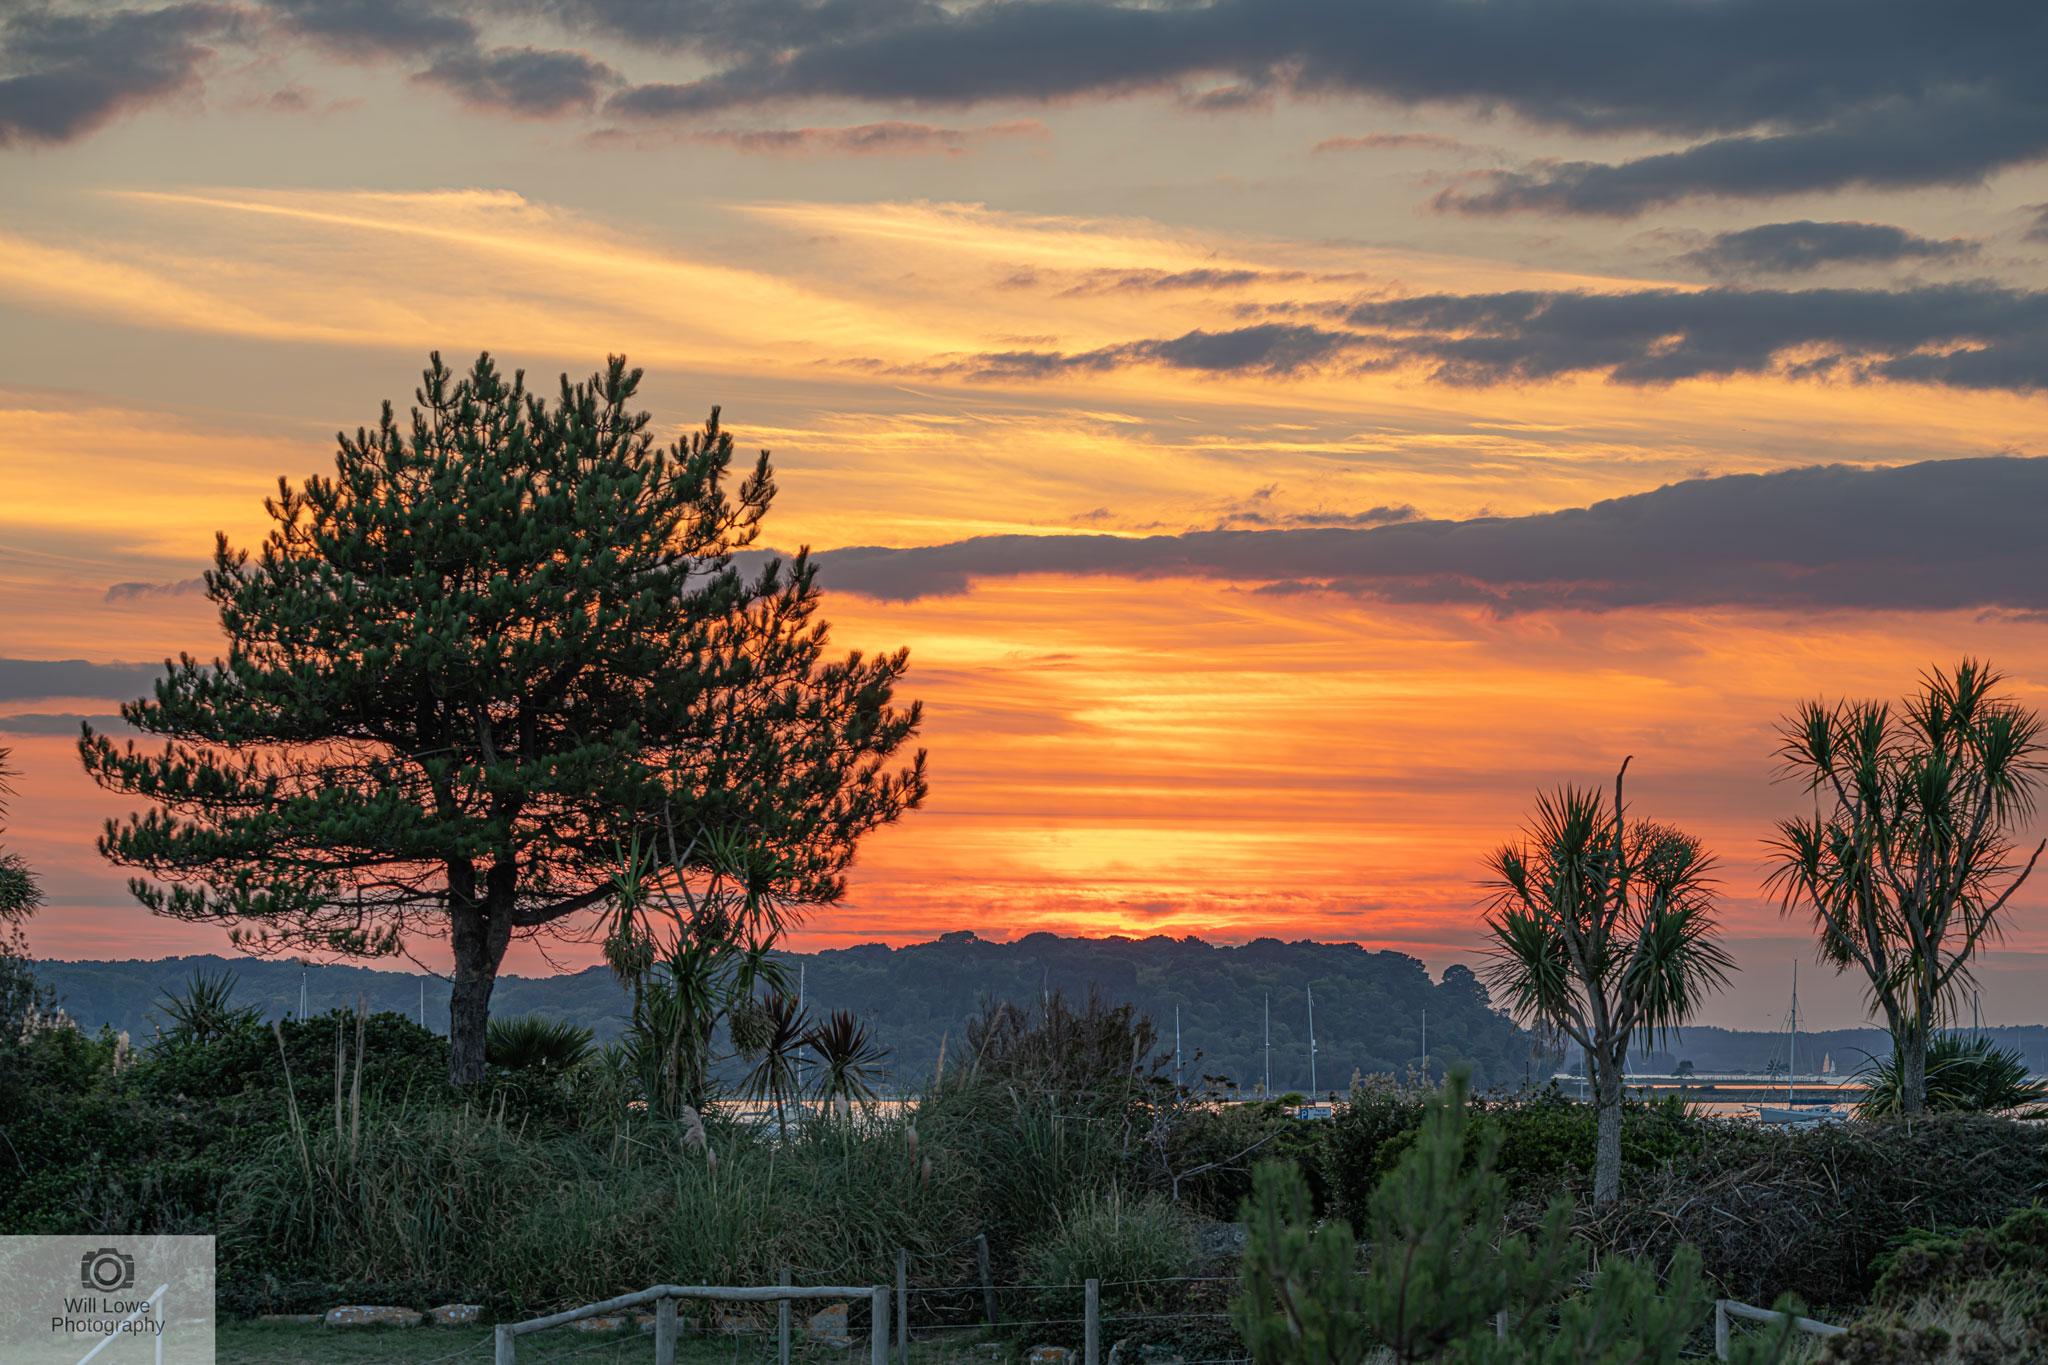 Sunset over Brownsea Island